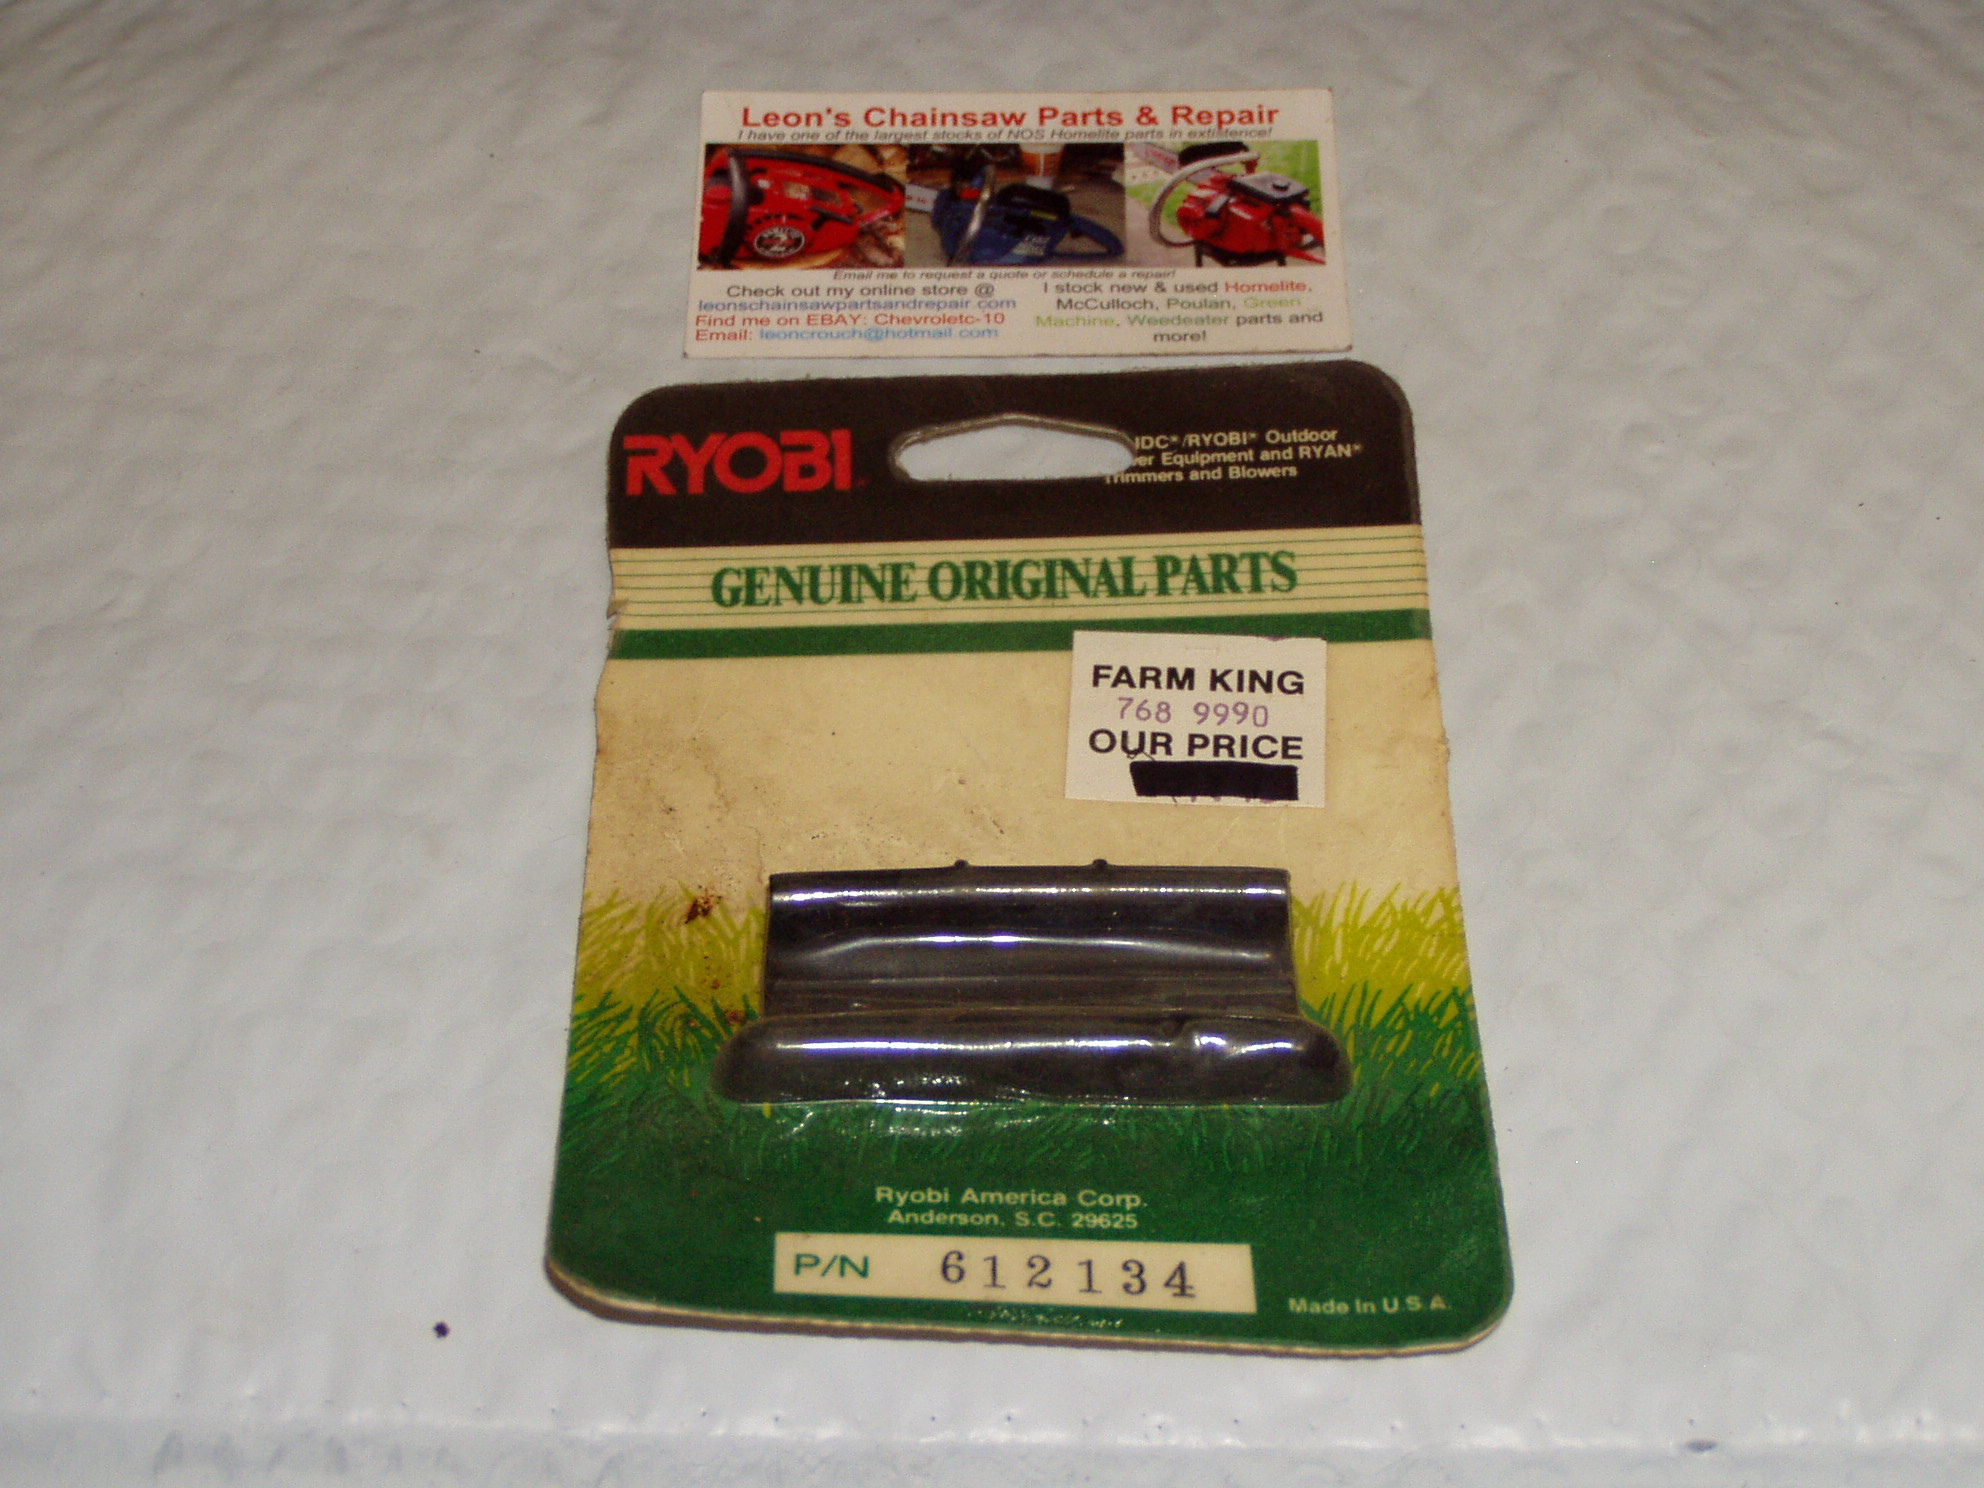 ryobi 720r fuel line diagram 95 jeep grand cherokee infinity gold wiring nos idc 120r 121r 122r 410r 600r 700r 704r